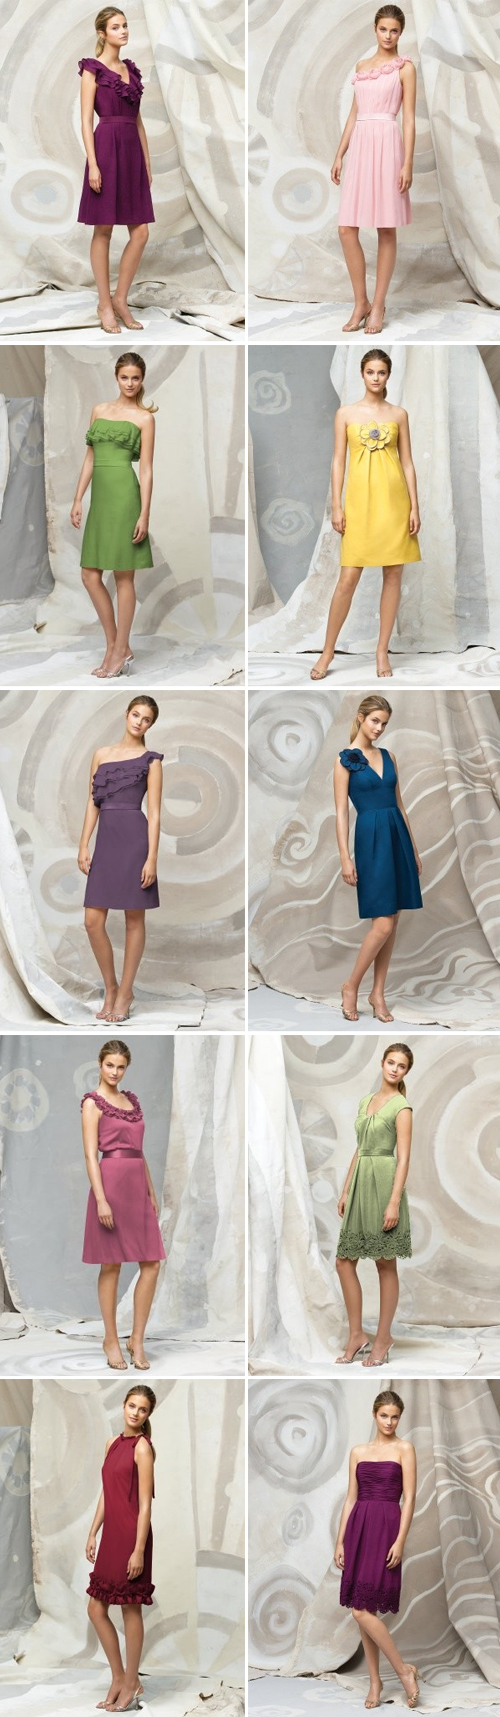 lela-rose-bridesmaids-2010-collection